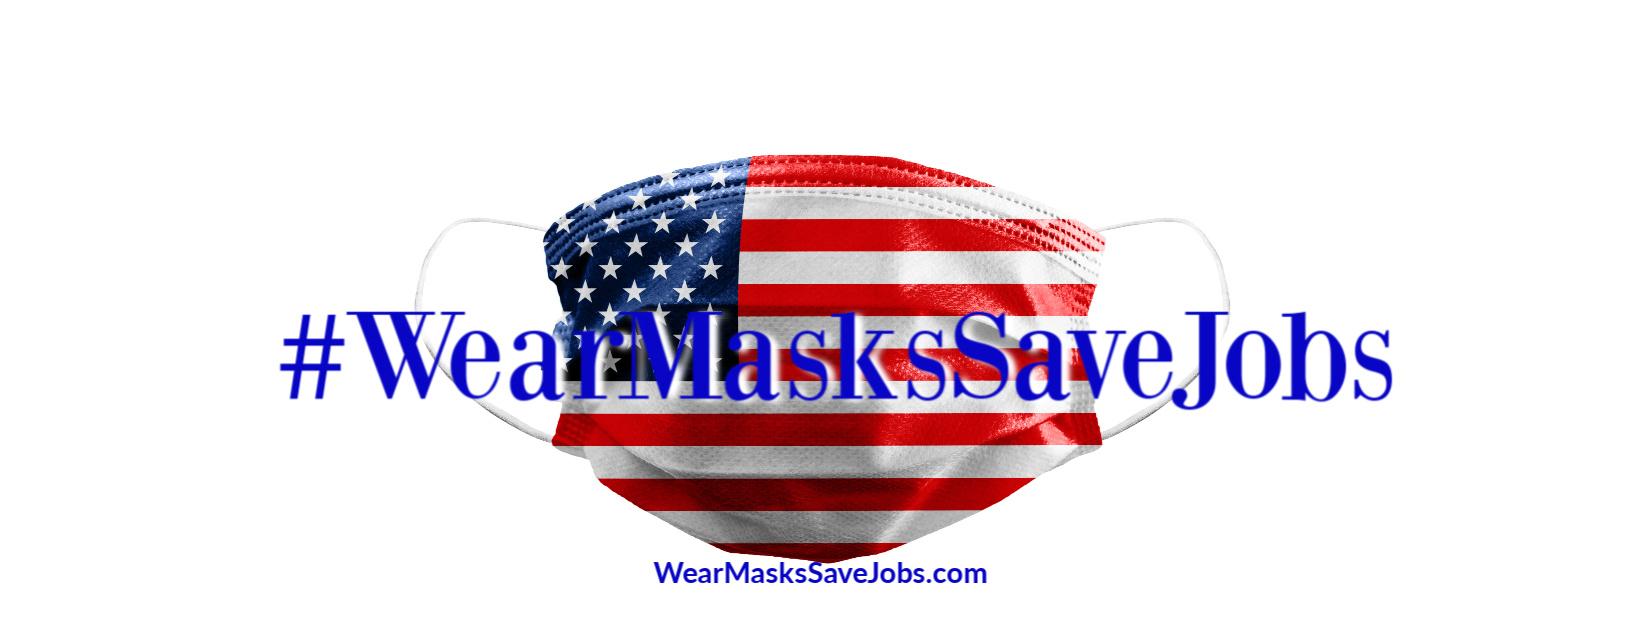 wear masks save jobs